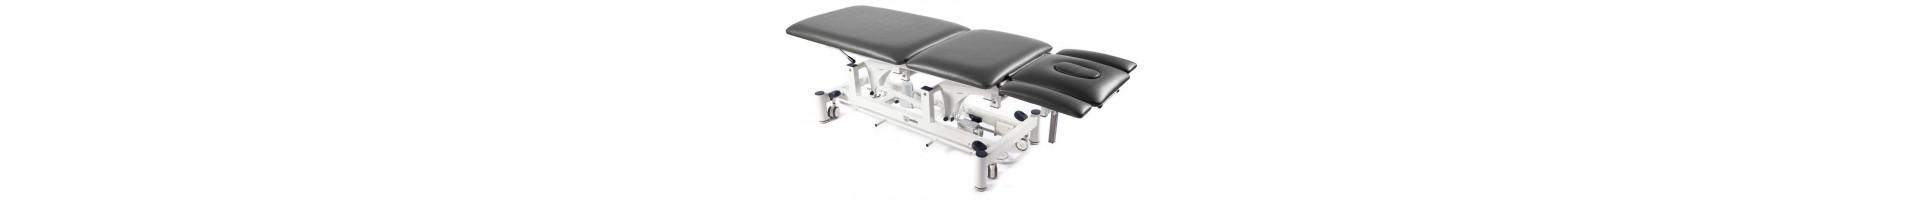 Comprar Camilla para fisioterapia | Comprar productos para fisioterapia online